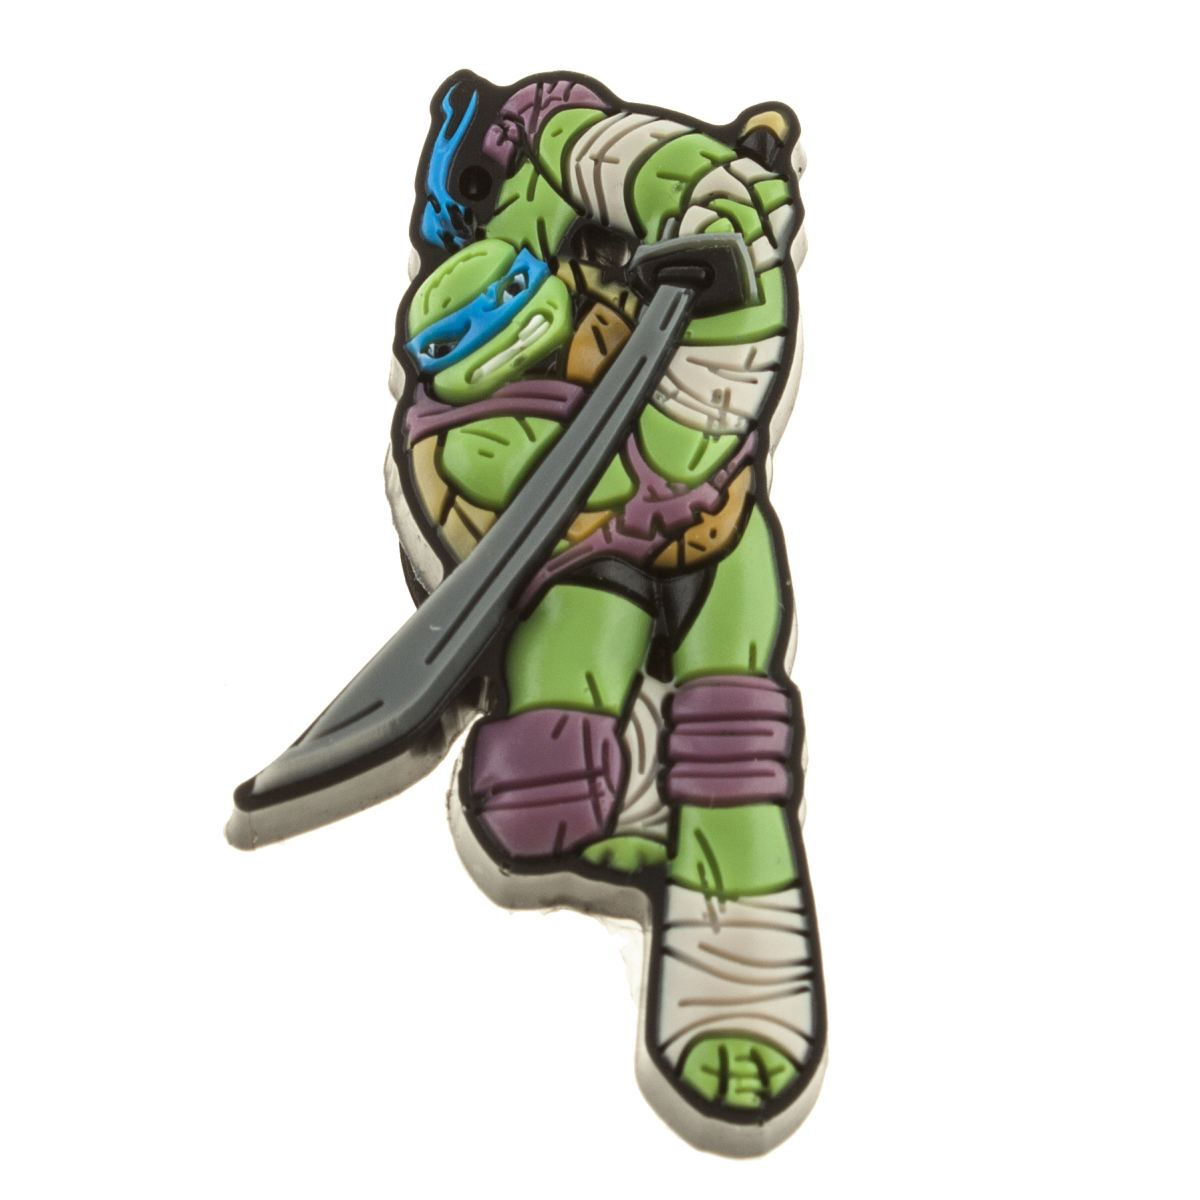 jibbitz Jibbitz Dark Green Ninja Turtles Leonardo Shoe Accessories